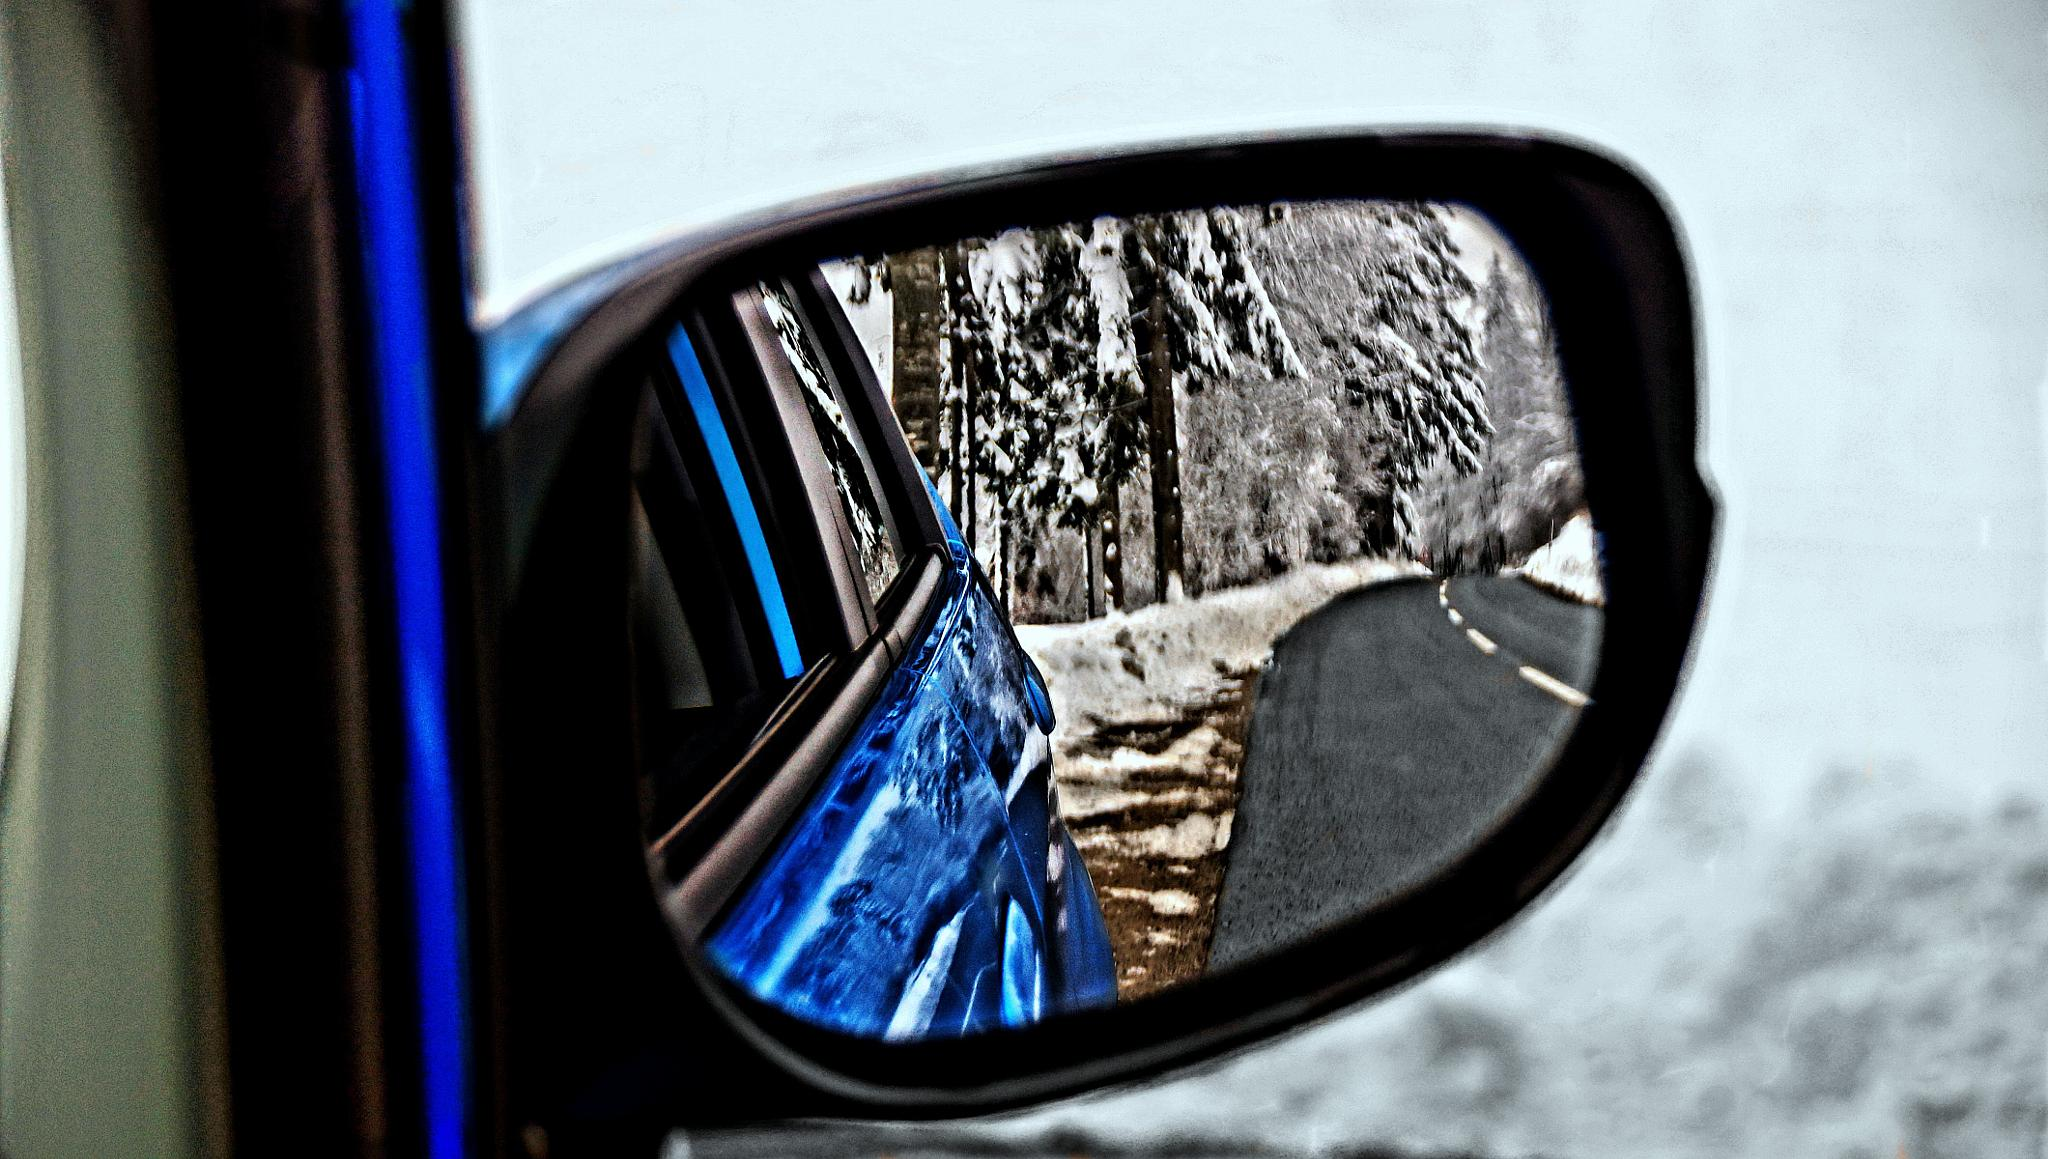 rearview mirror by sreten nakićenović